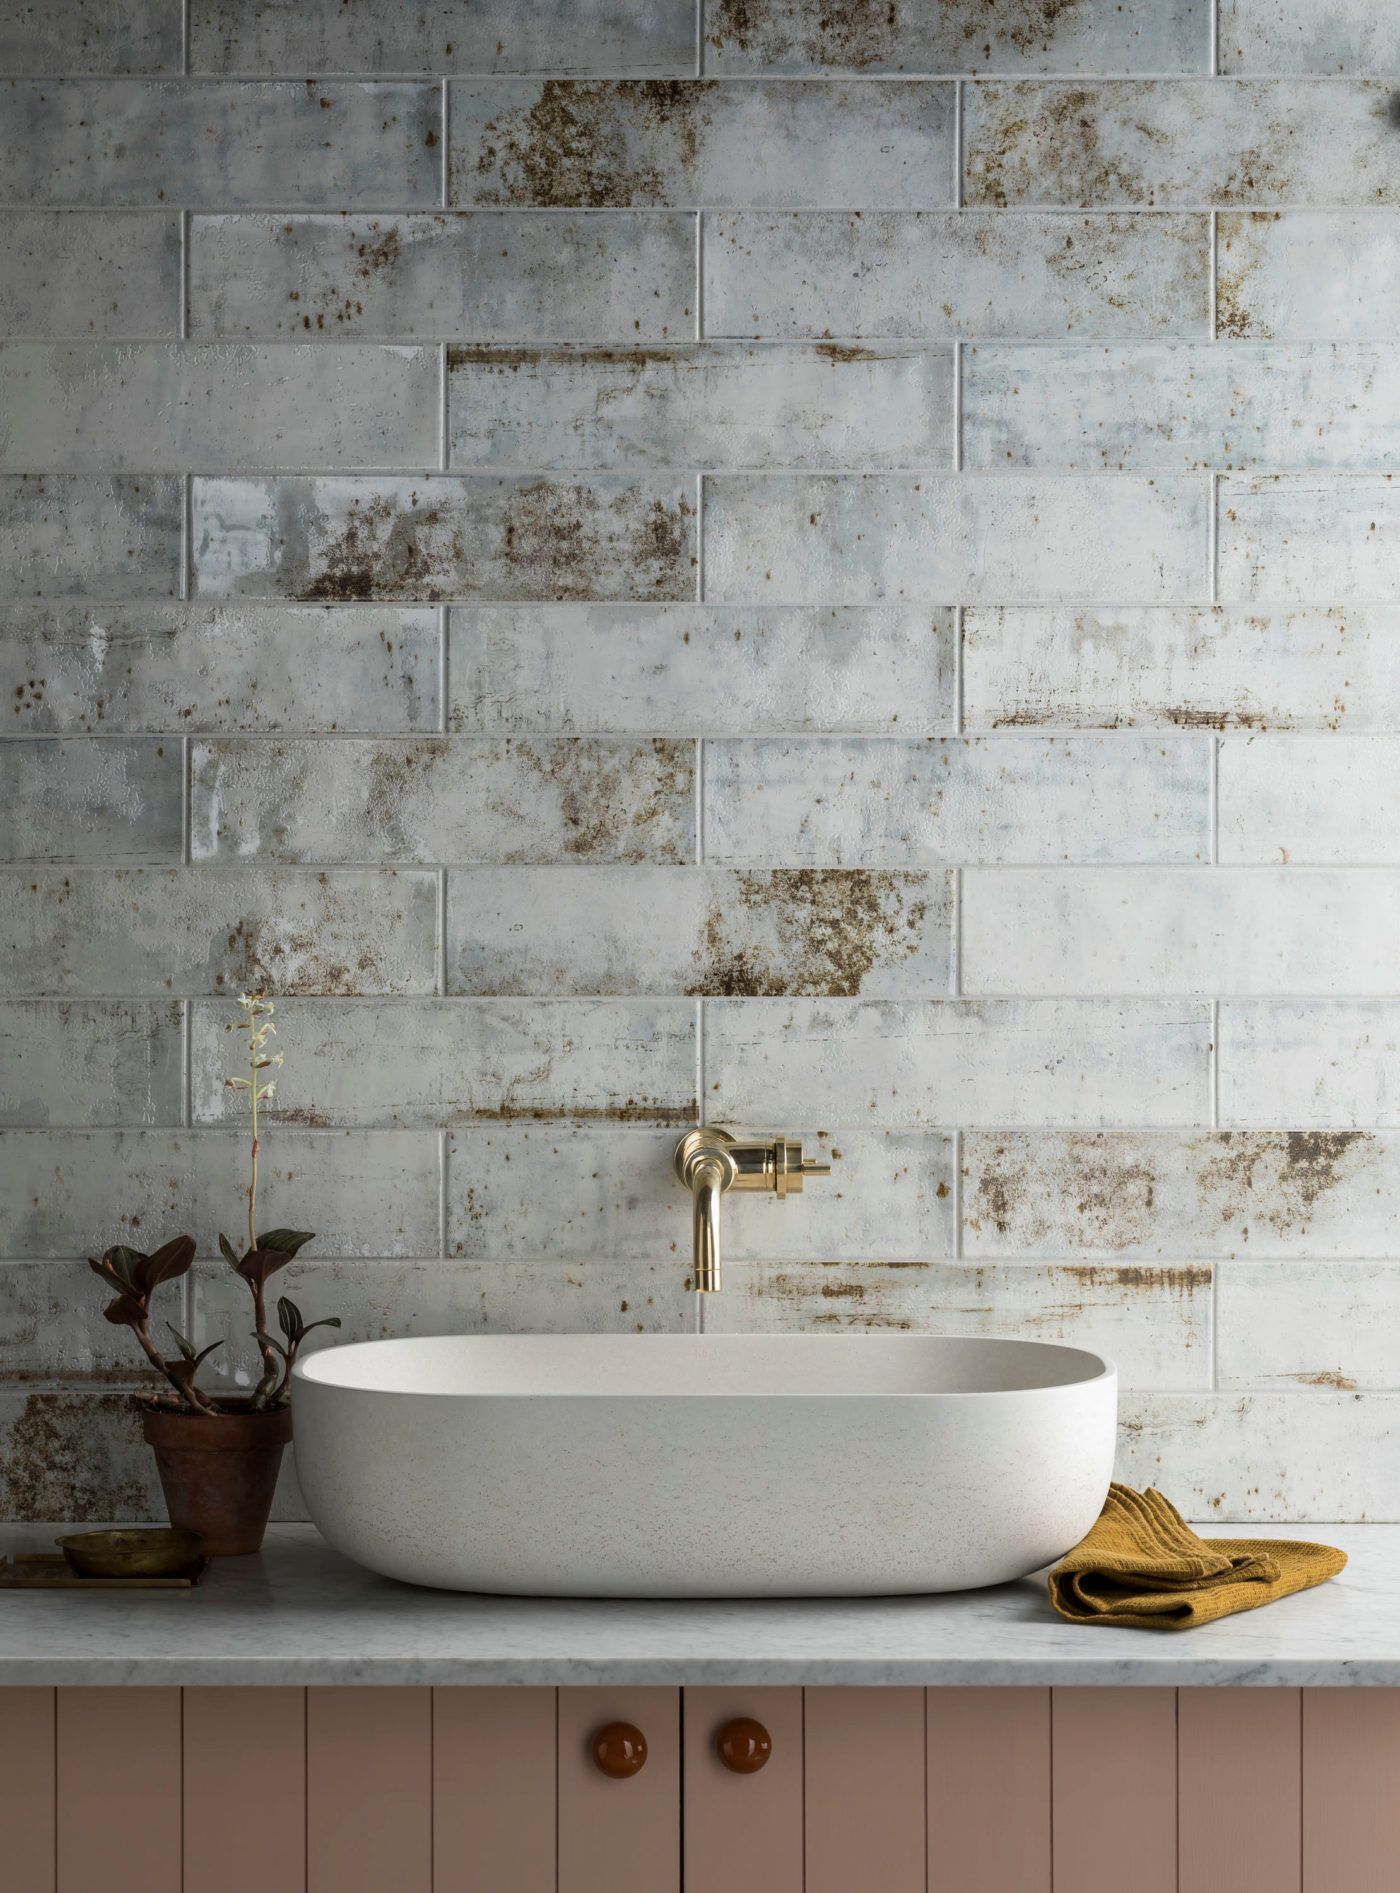 8 Divine Glass Shower Remodel Ideas Ideas In 2020 White Ceramic Tiles Mandarin Stone Industrial Style Bathroom